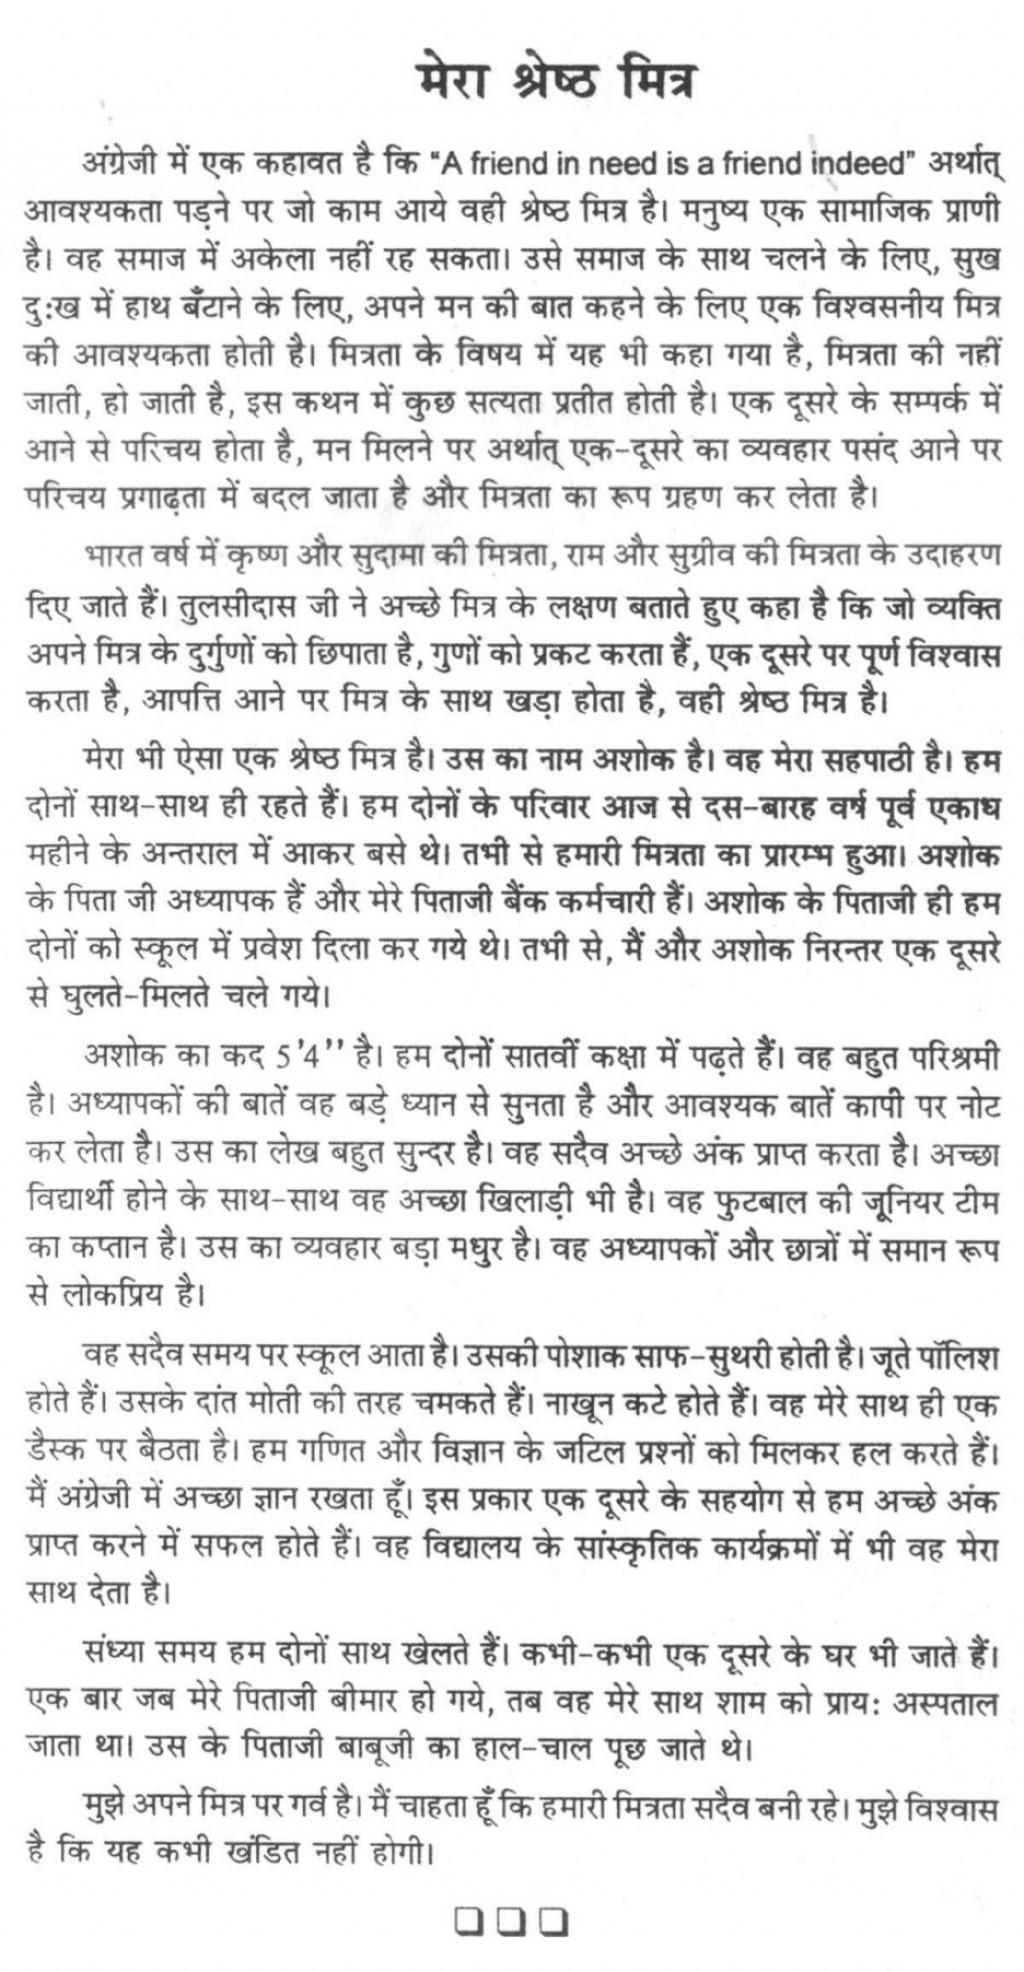 003 Essay Example Qualities Of Good Friends Friend Thumb Teacher Great Characteristics Pdf In Hindi Three Free Language Urdu Amazing A Conclusion Spm Large